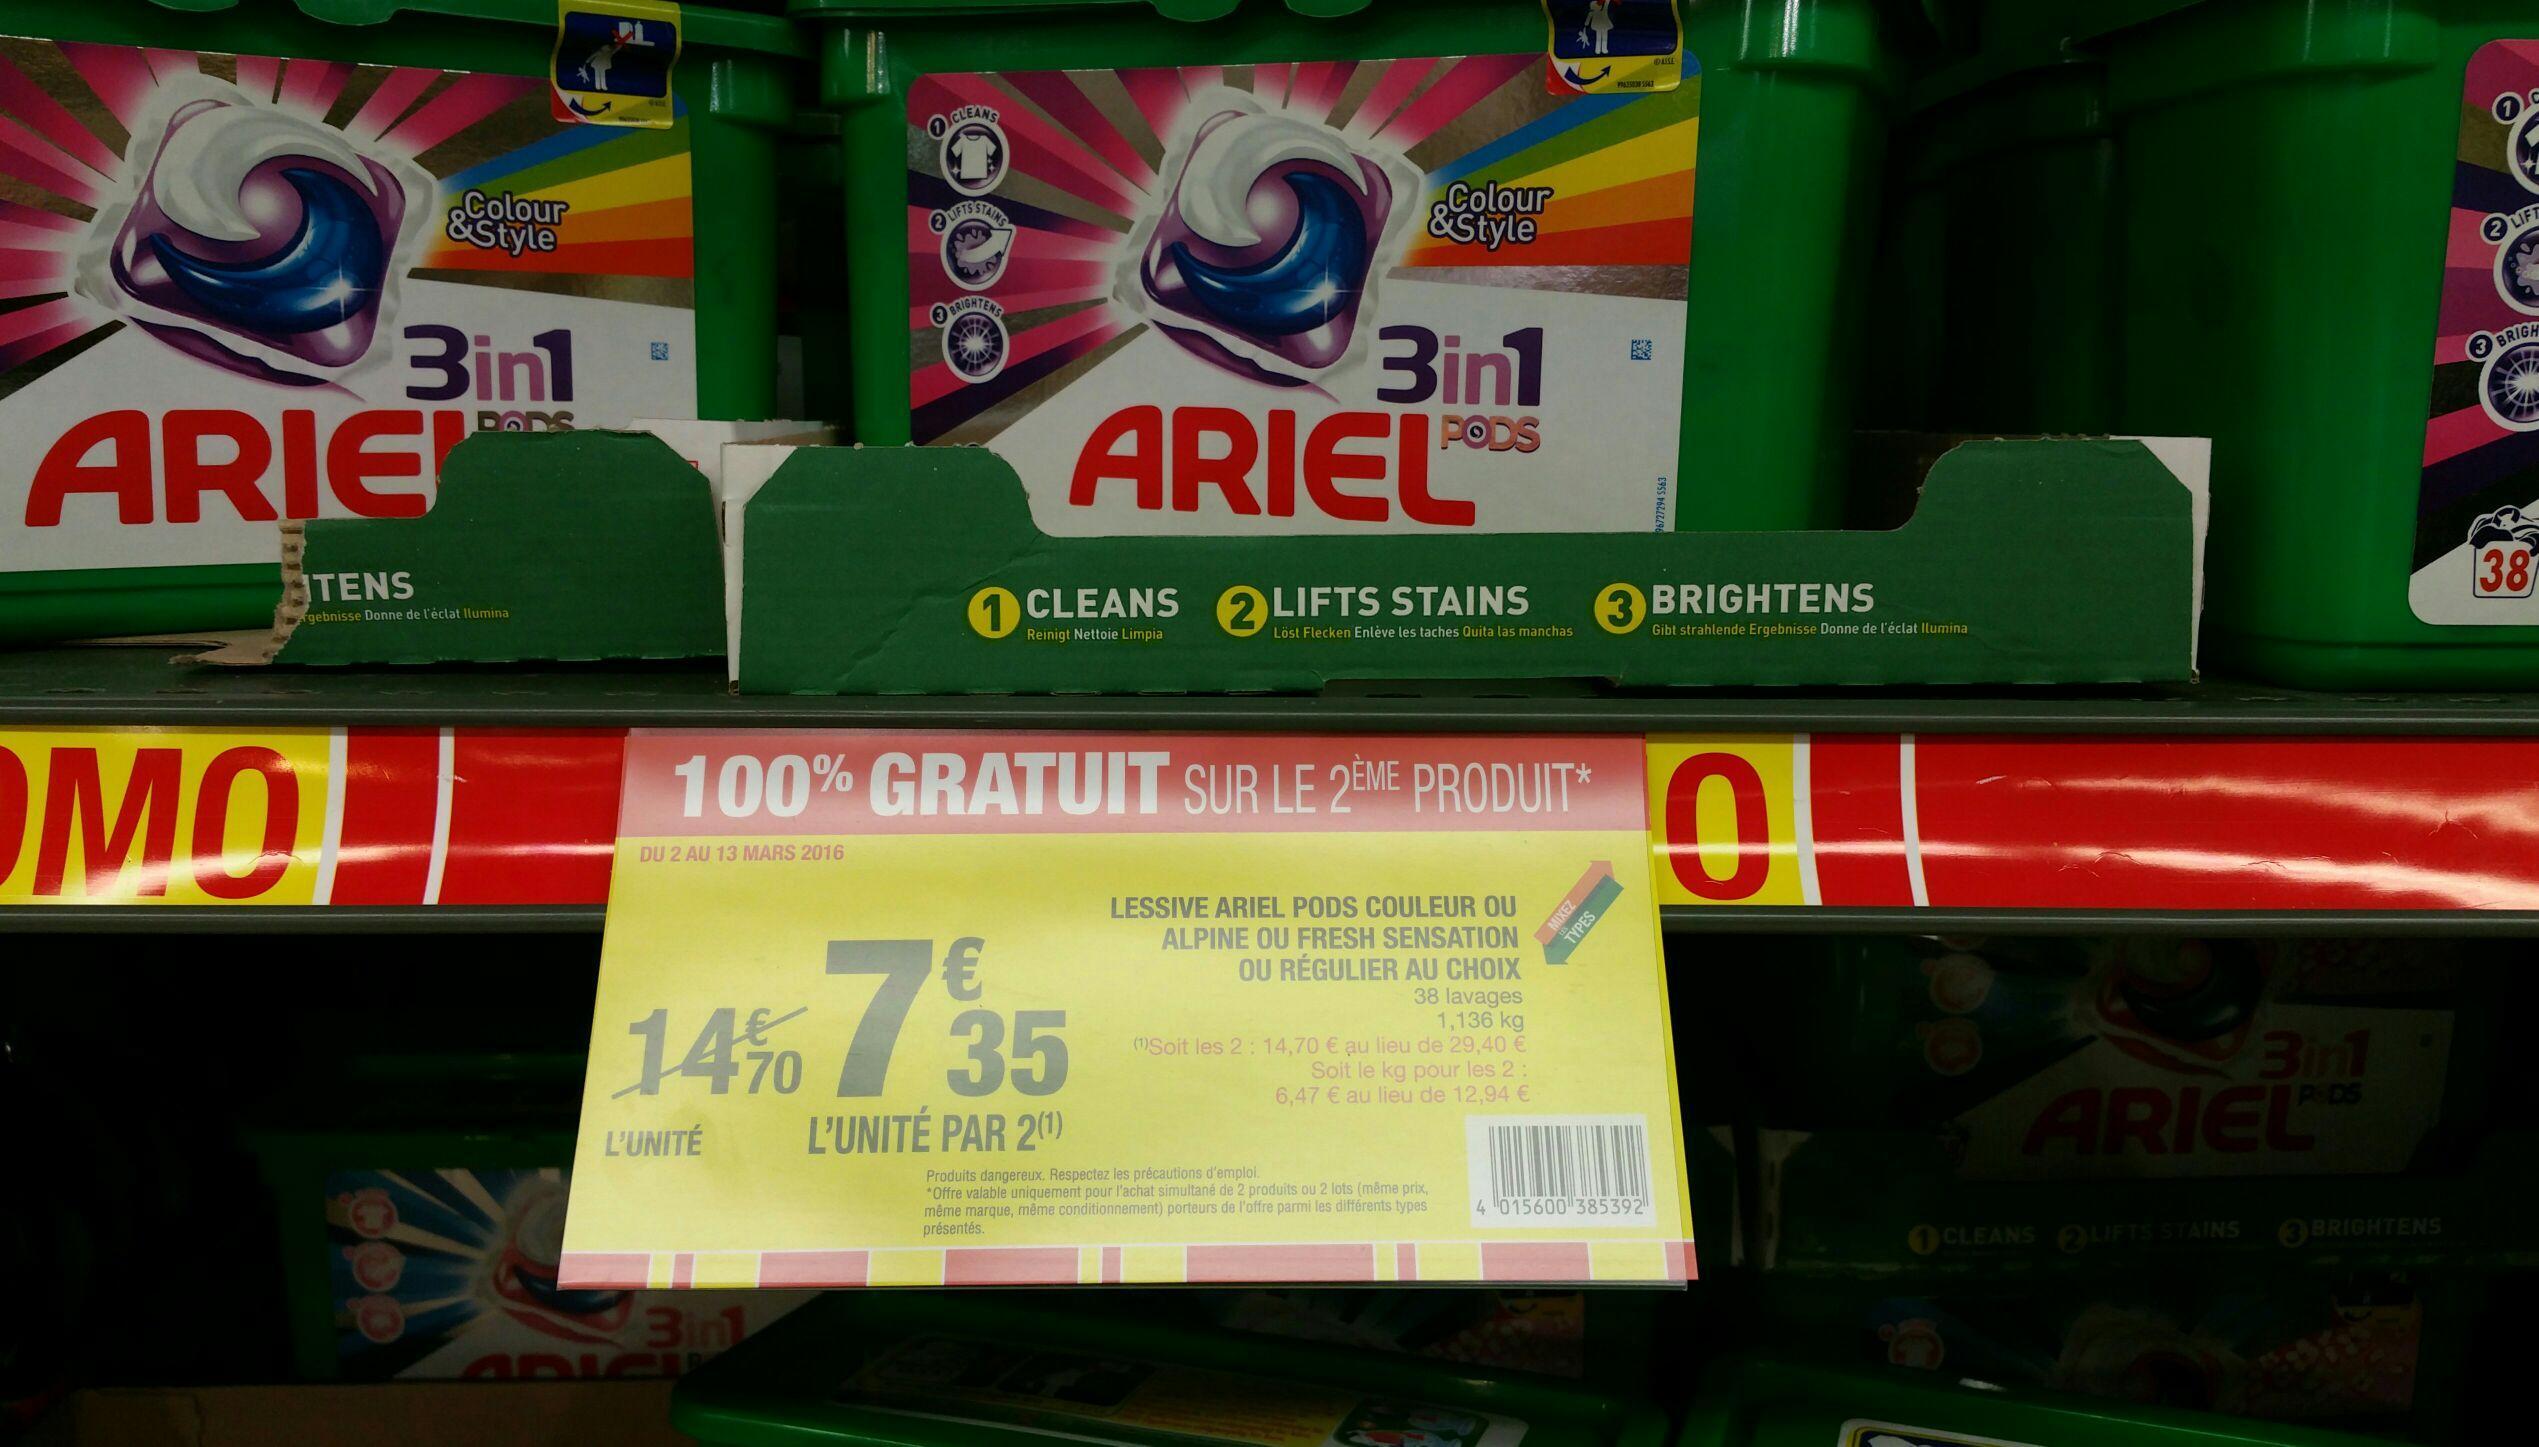 2 packs de 38 capsules de lessive Ariel 3-en-1